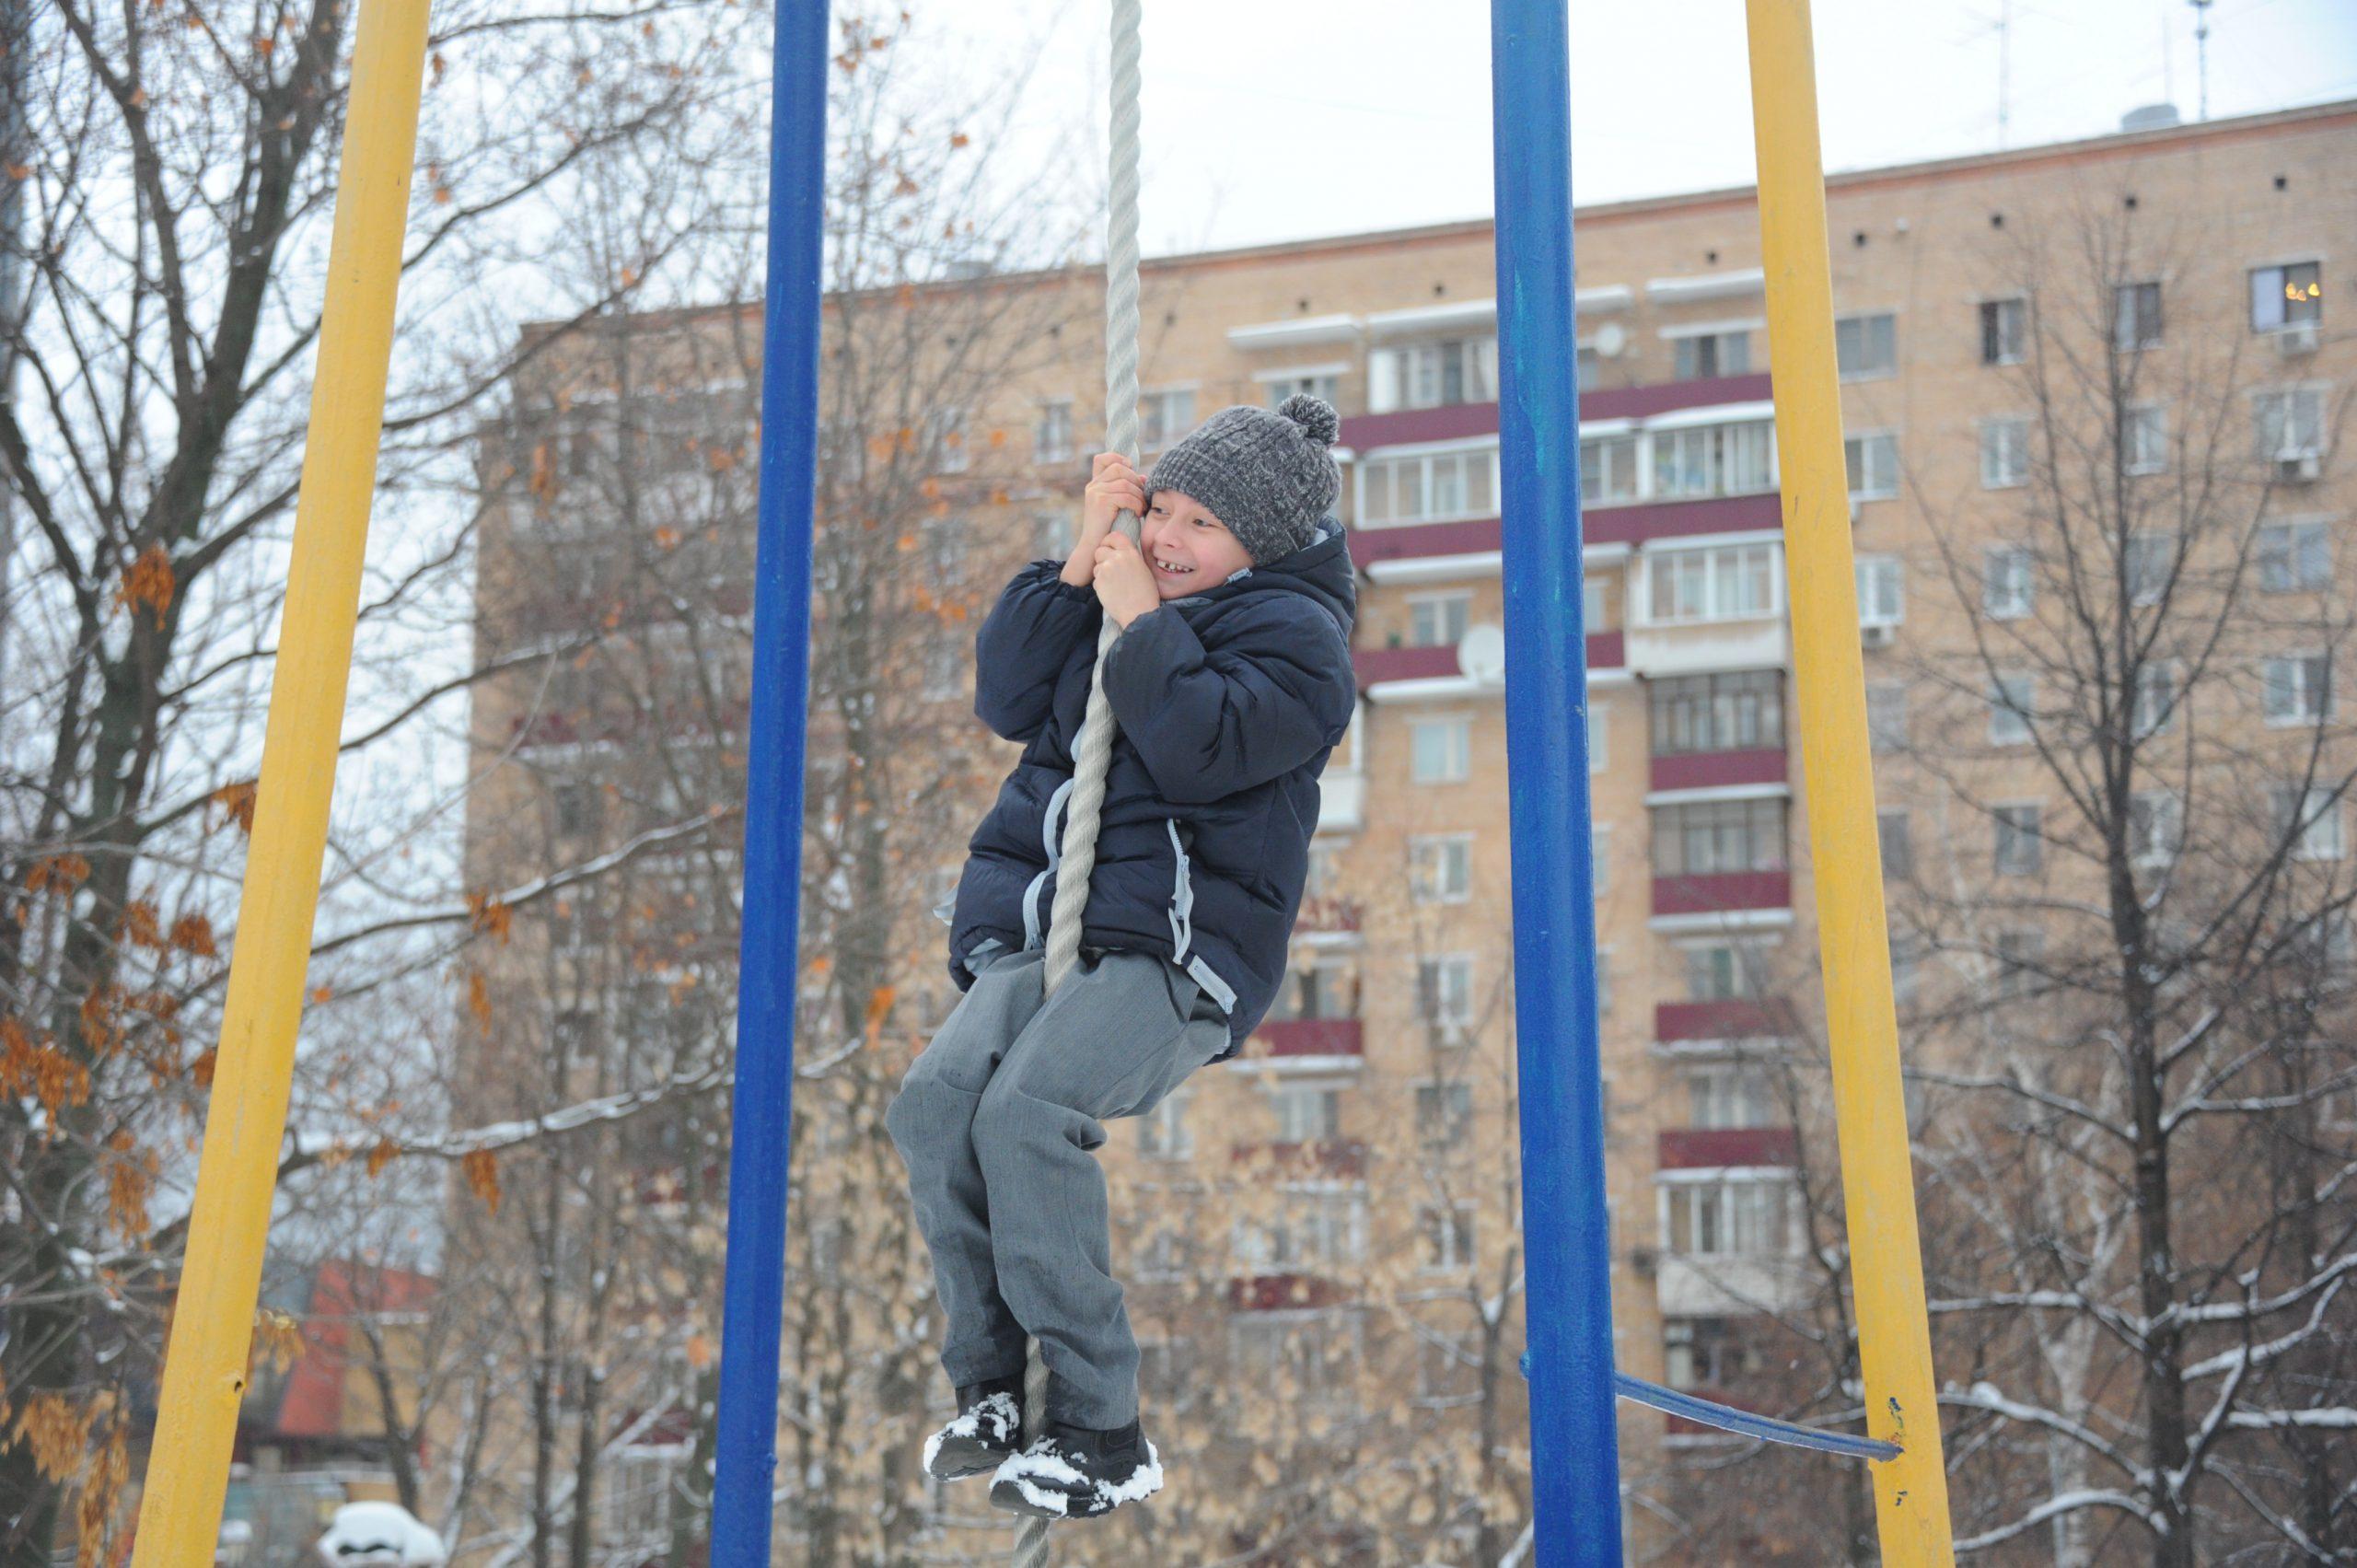 Рыцарский турнир провели в школе №2065 поселения Московский. Фото: Светлана Колоскова, «Вечерняя Москва»